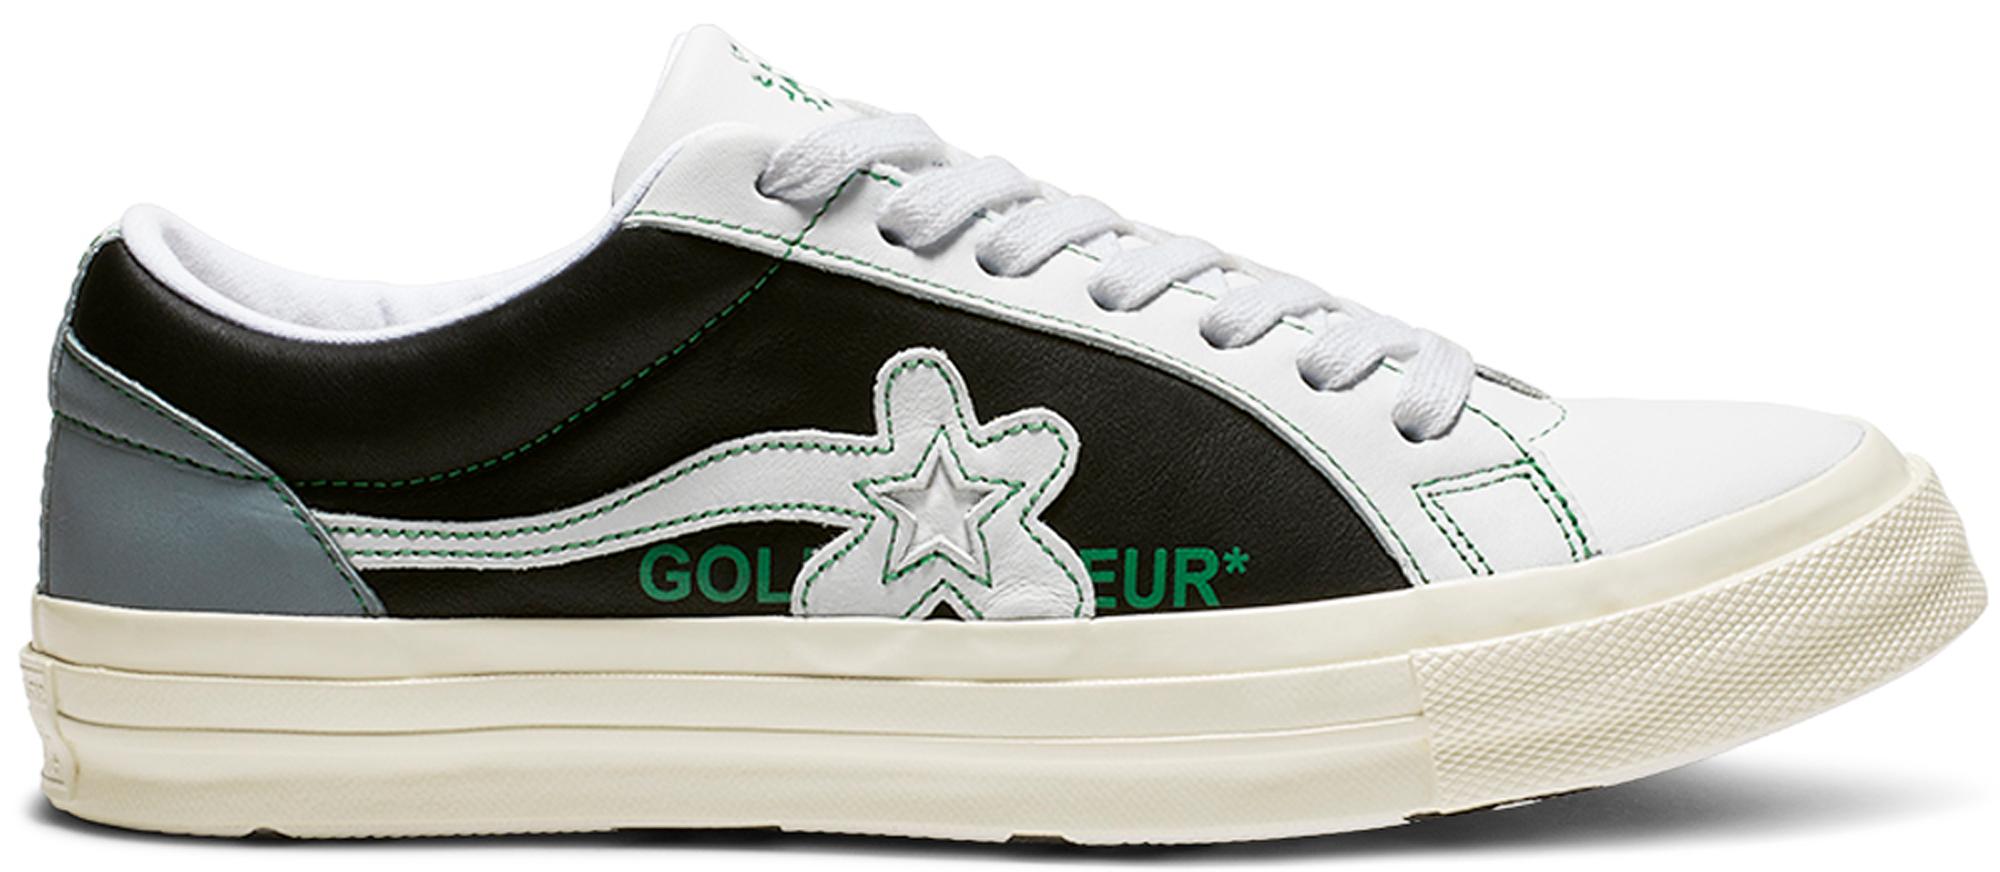 8a396ce7d710 HypeAnalyzer · Converse One Star Ox Golf Le Fleur Industrial Pack Black